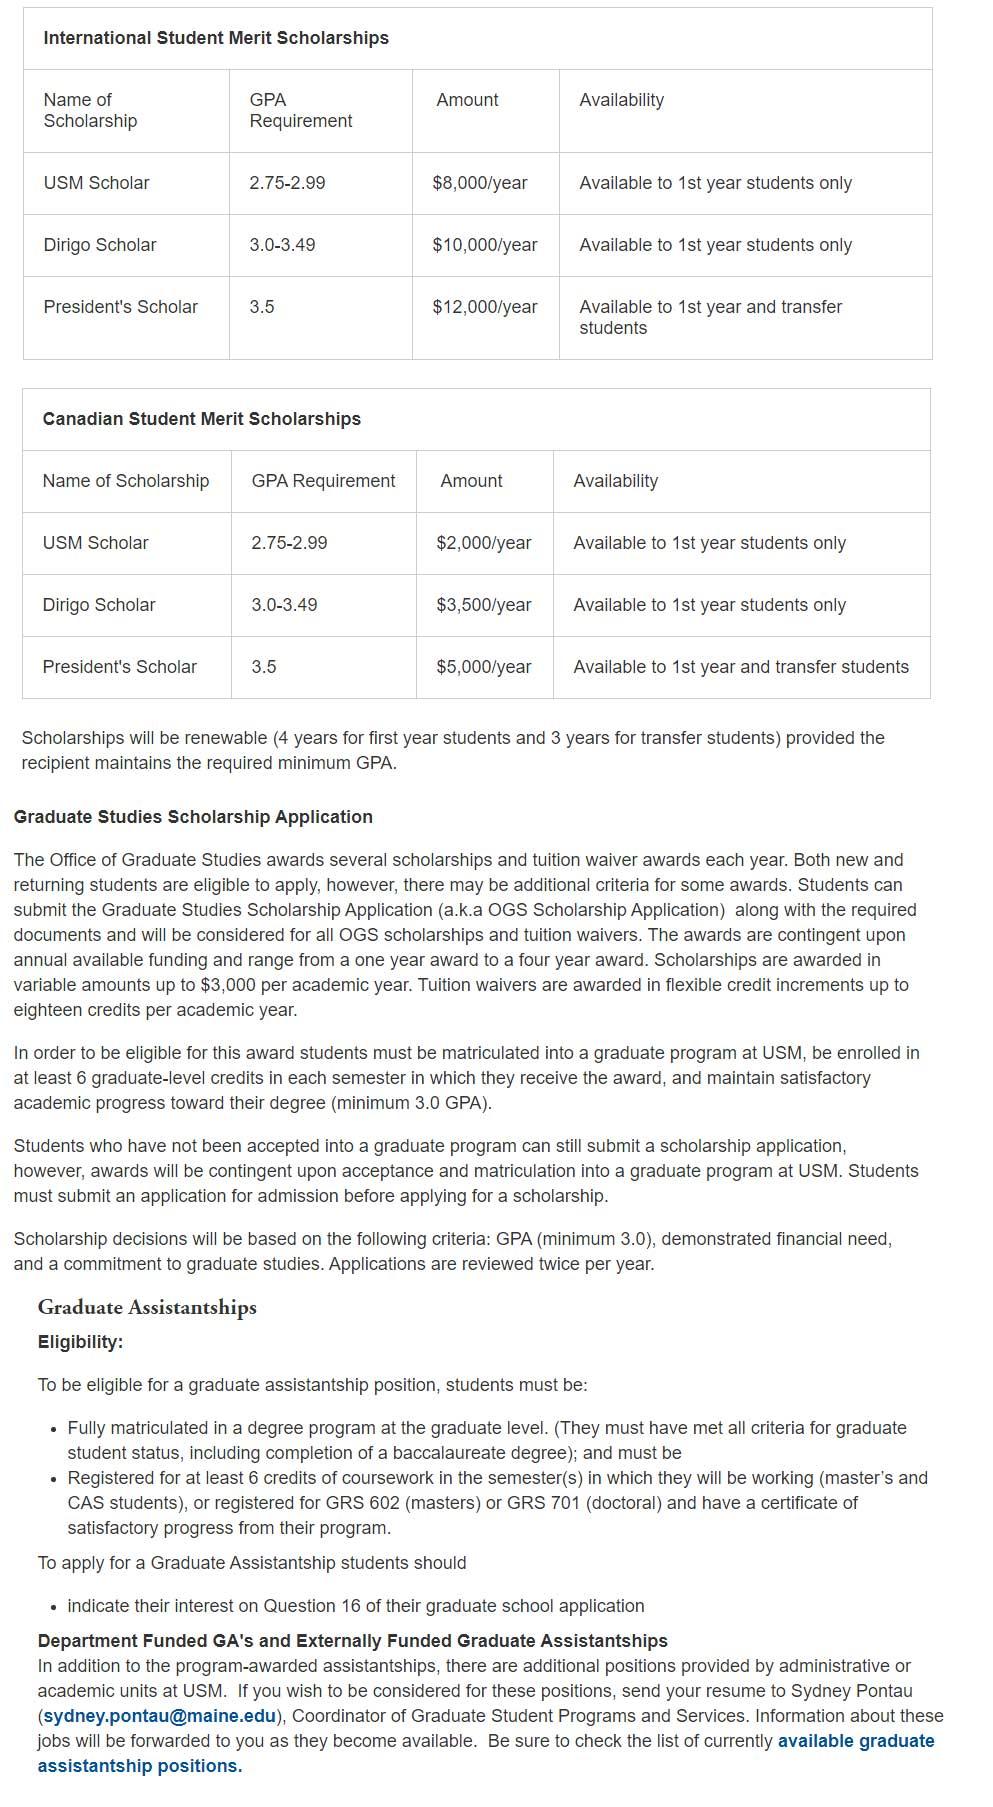 https://ishallwin.com/Content/ScholarshipImages/University-Of-Southern-Maine---Undergraduate-International-Merit-Scholarship-2.jpg